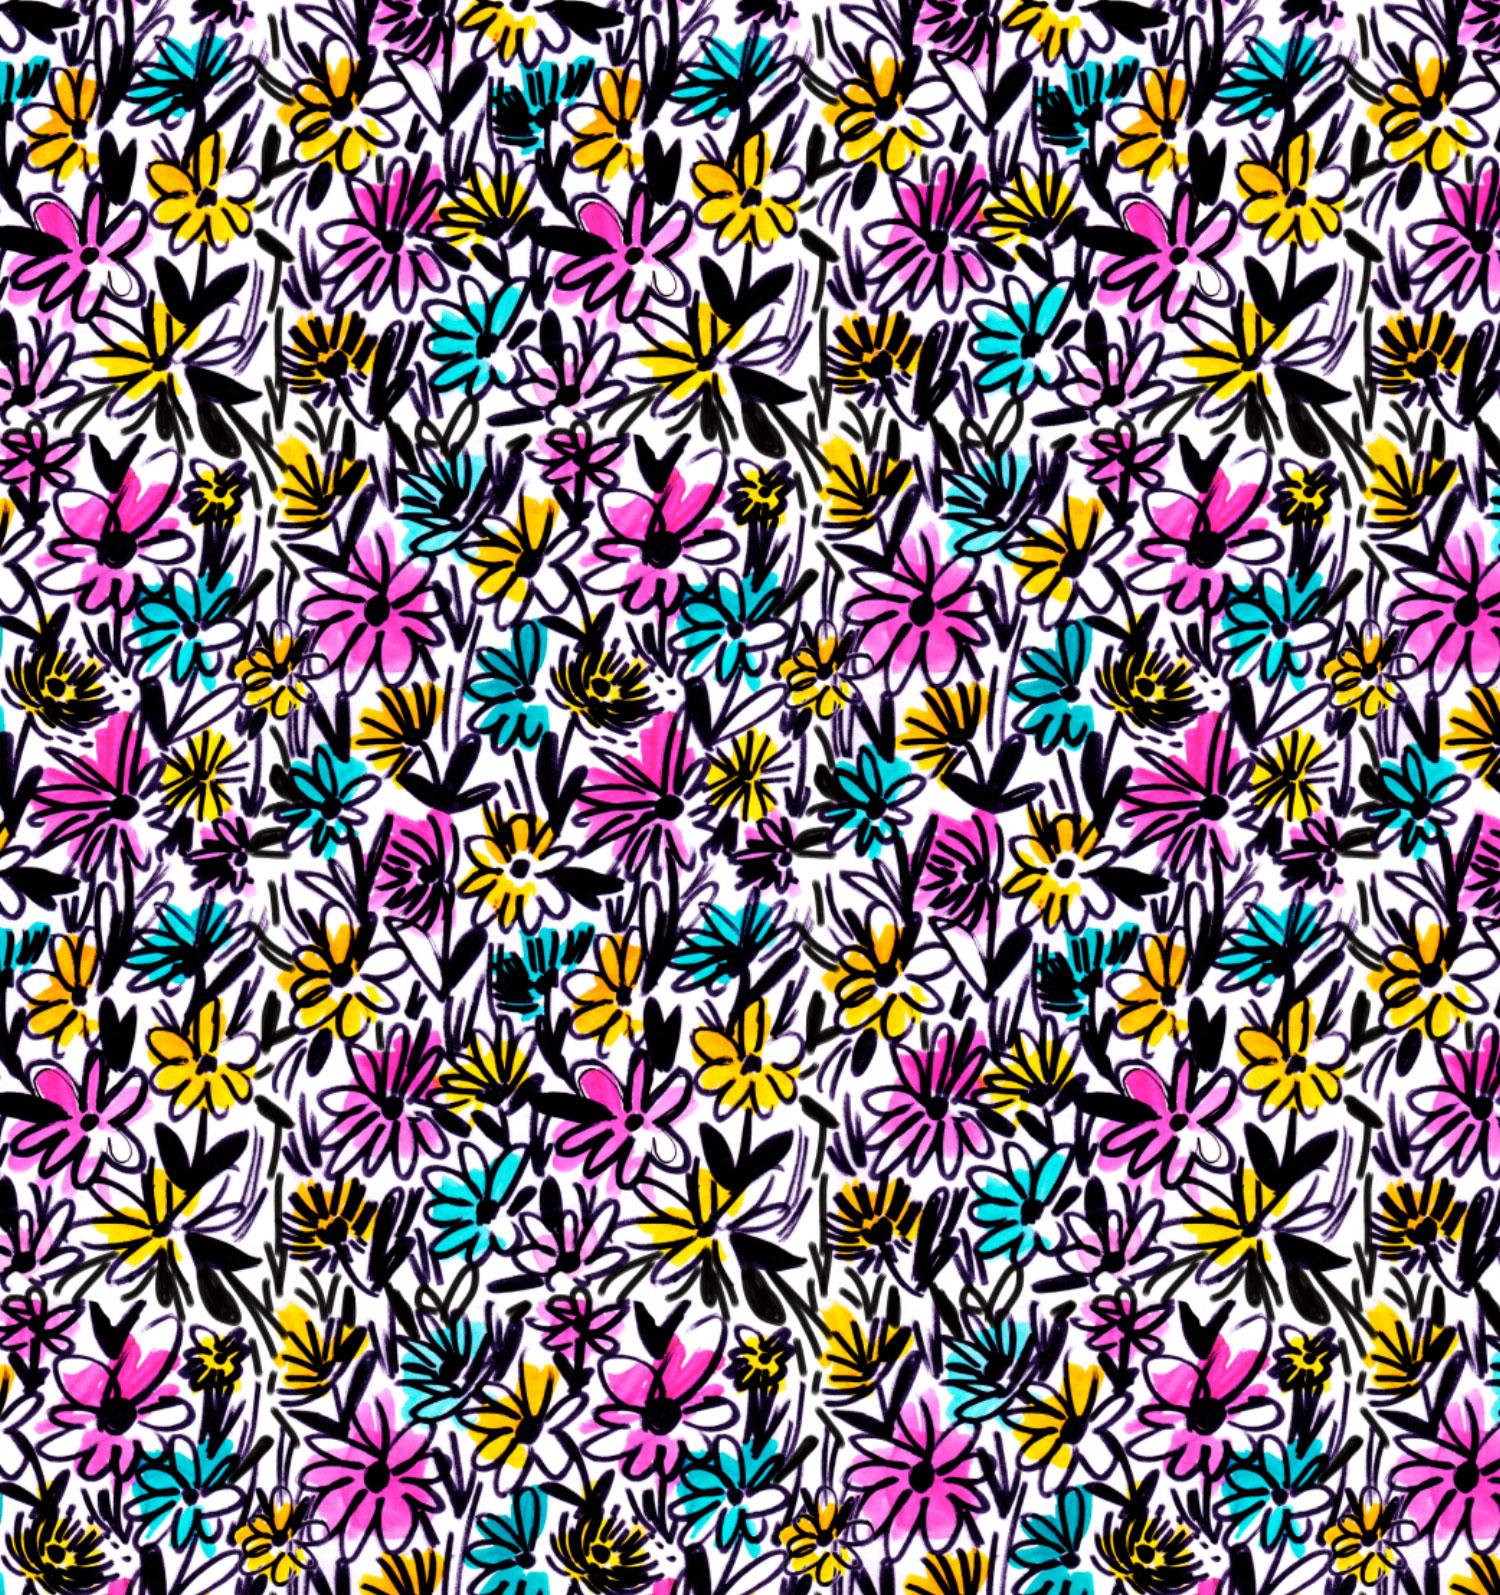 abstractfloral_repeat2.jpg